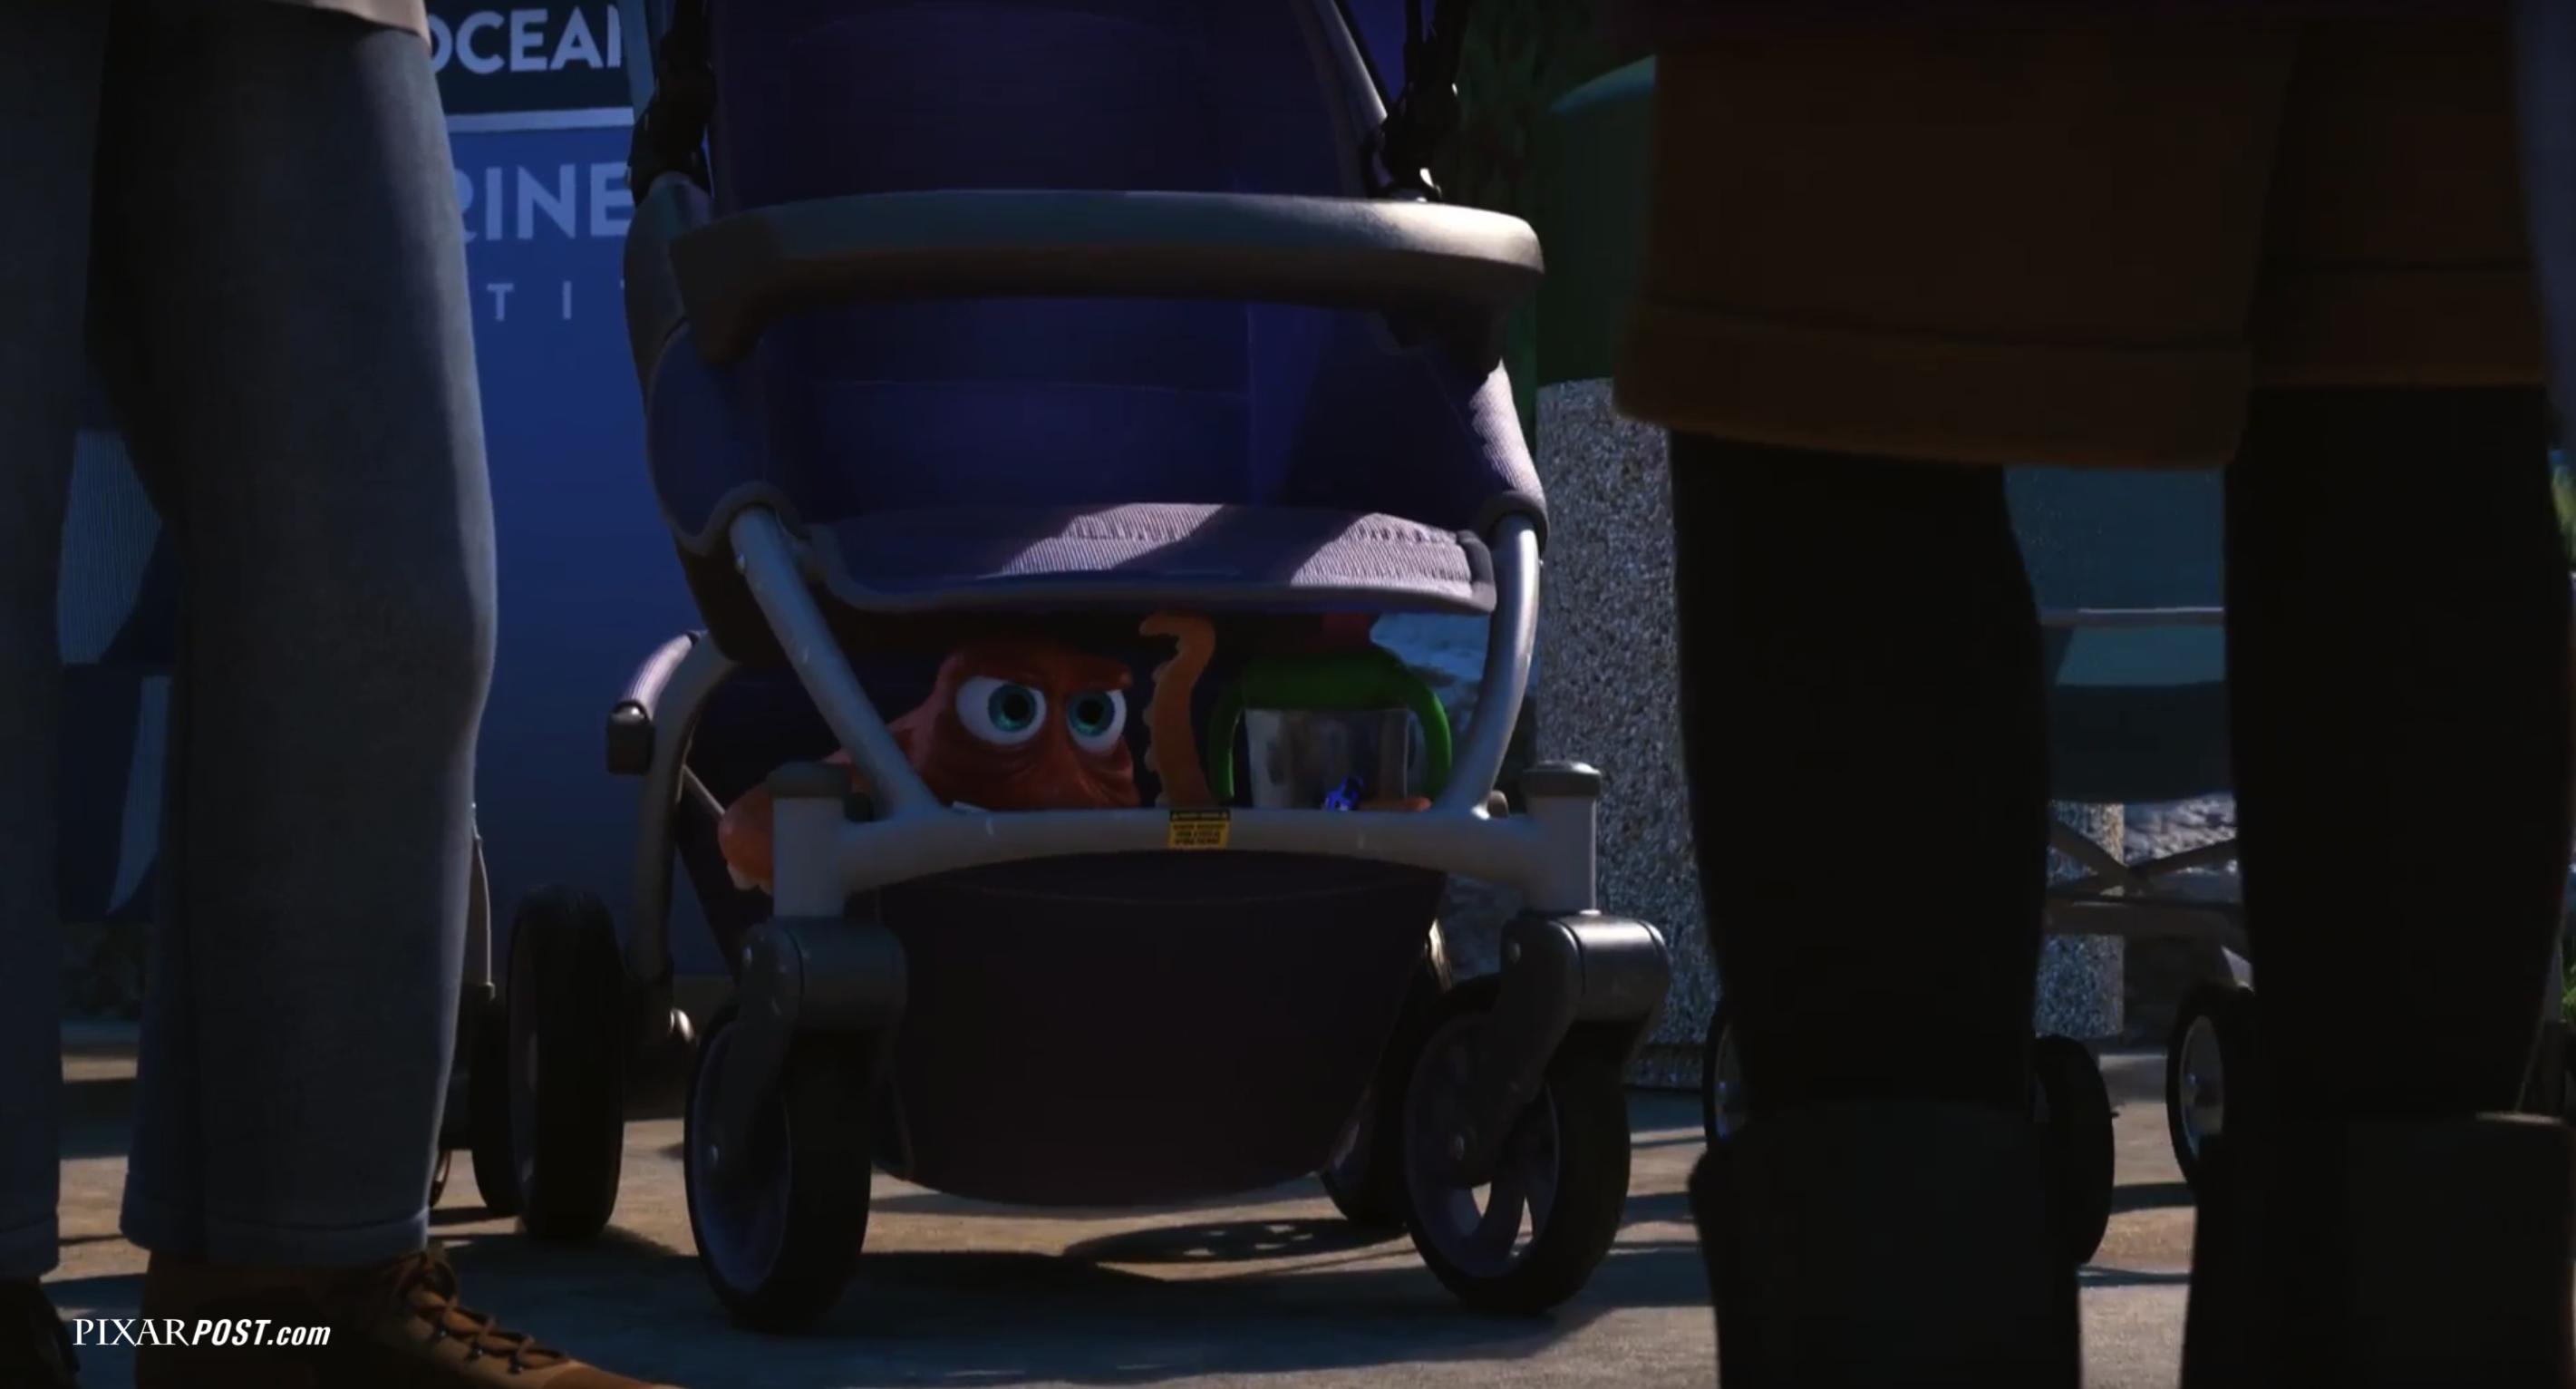 Finding Dory International Pixar Post 9.png